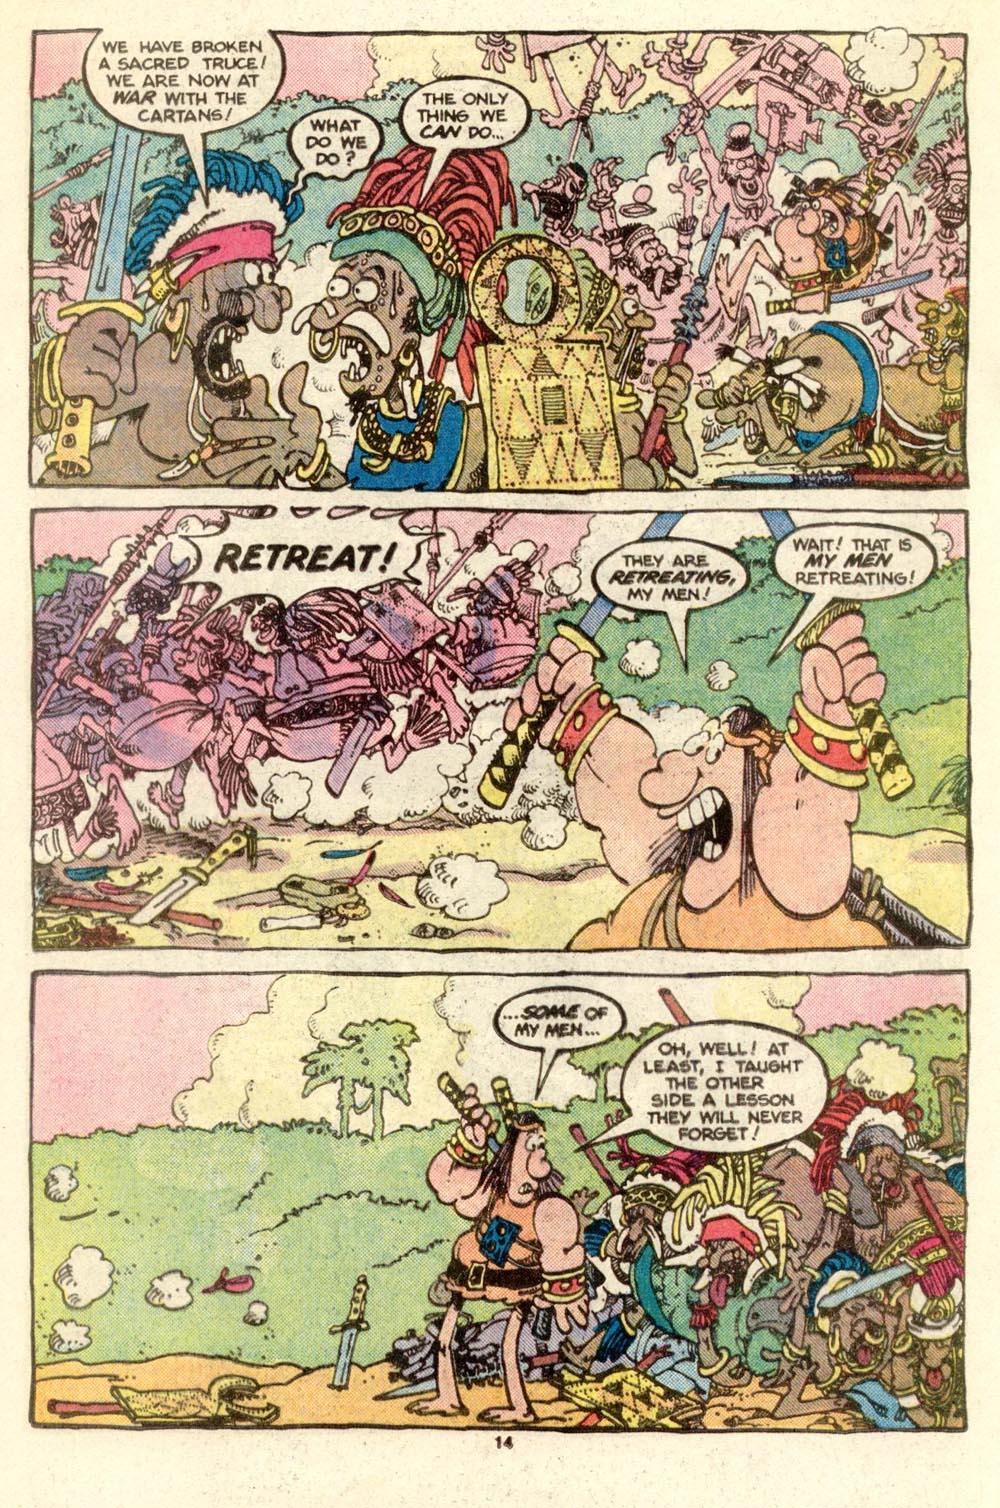 Read online Sergio Aragonés Groo the Wanderer comic -  Issue #17 - 14